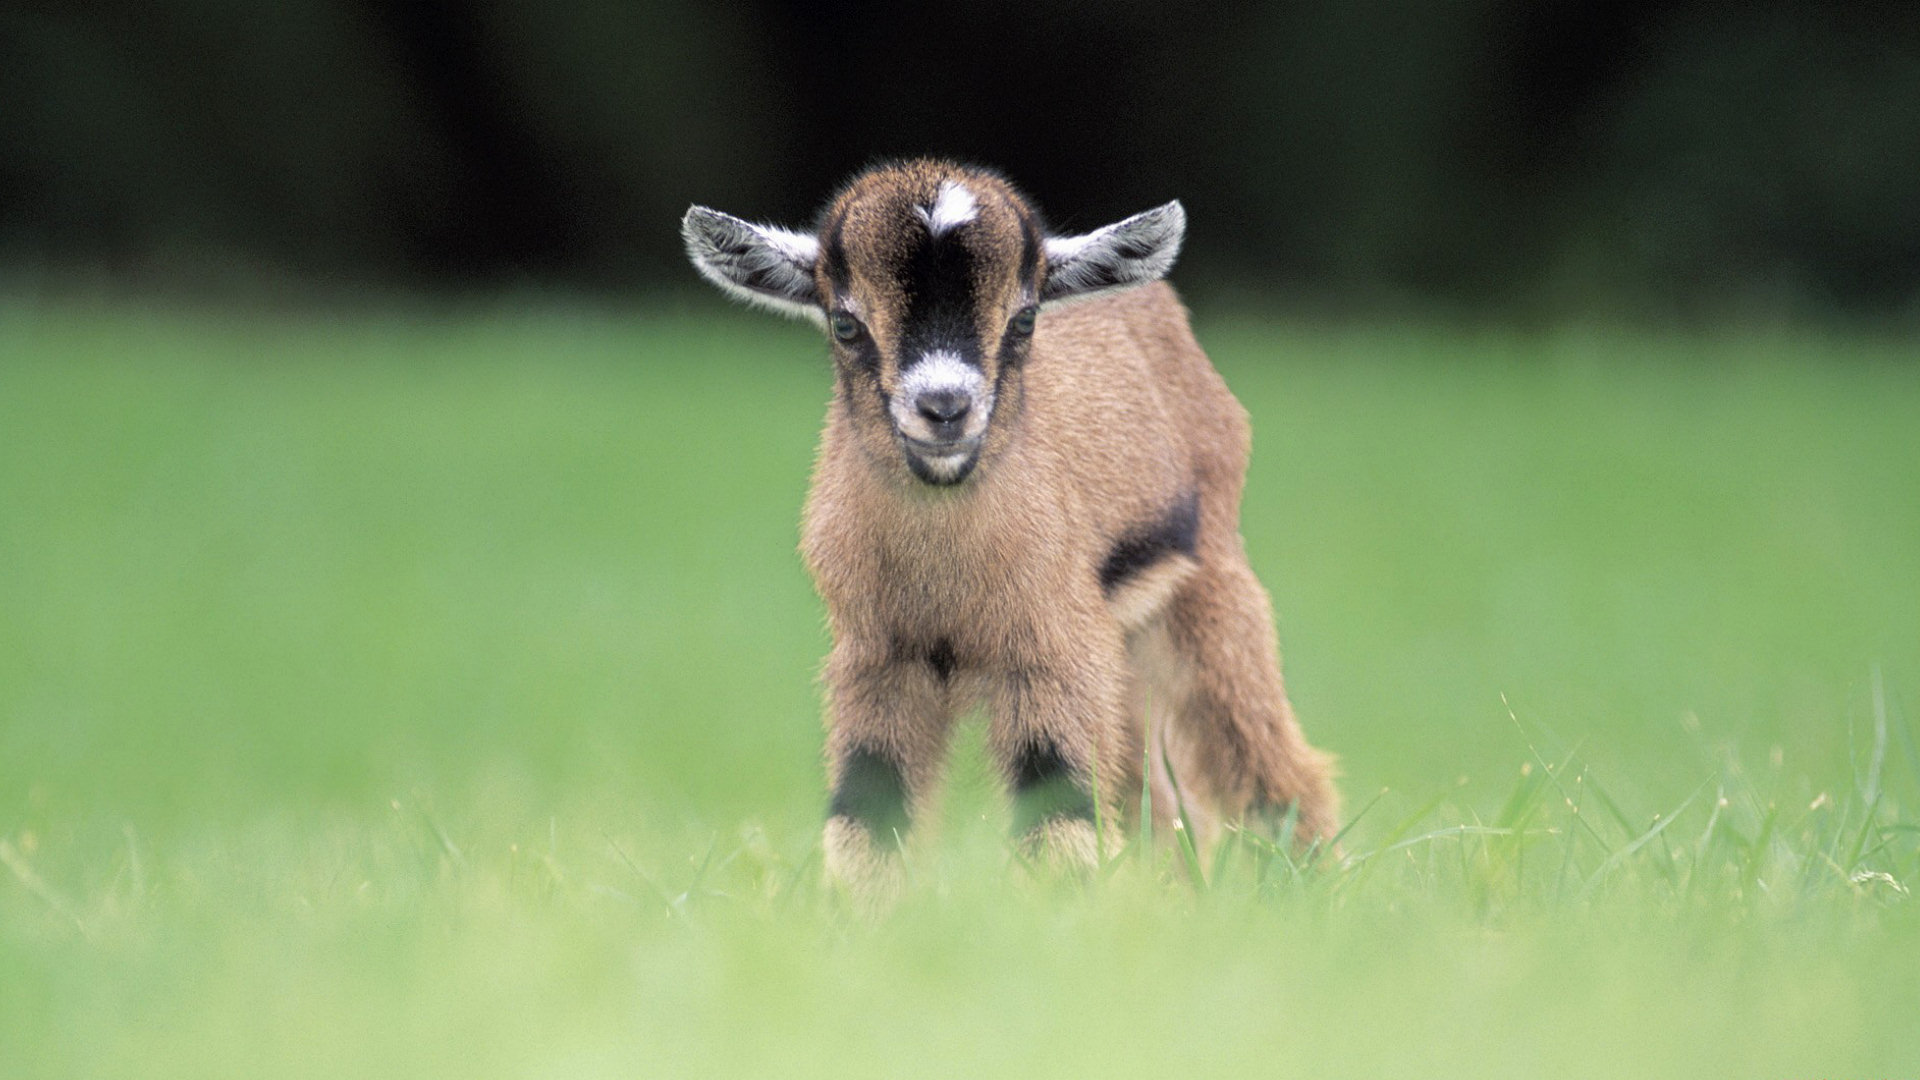 goat images